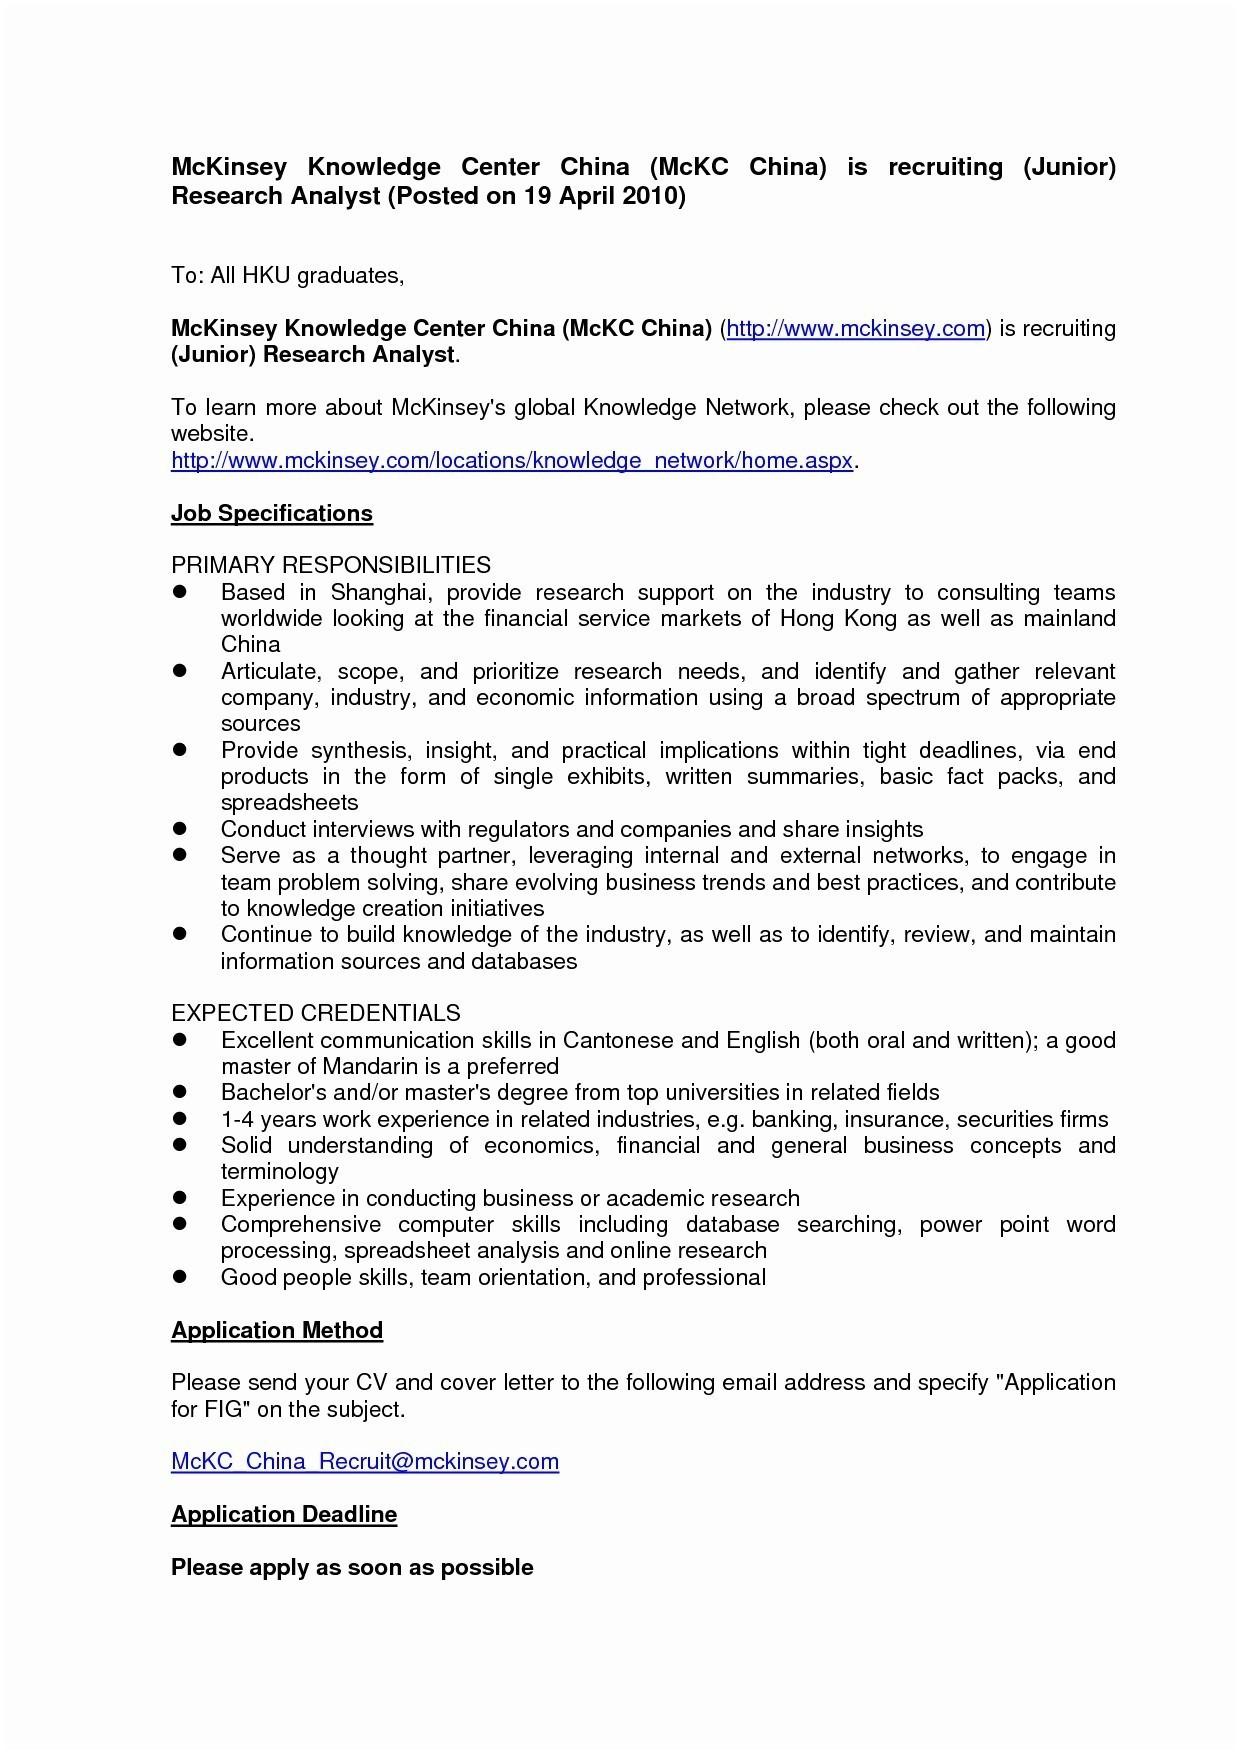 Formal Job Offer Letter Template - formal Job Fer Letter Inspirationa Sample for Job Fer Letter Fresh